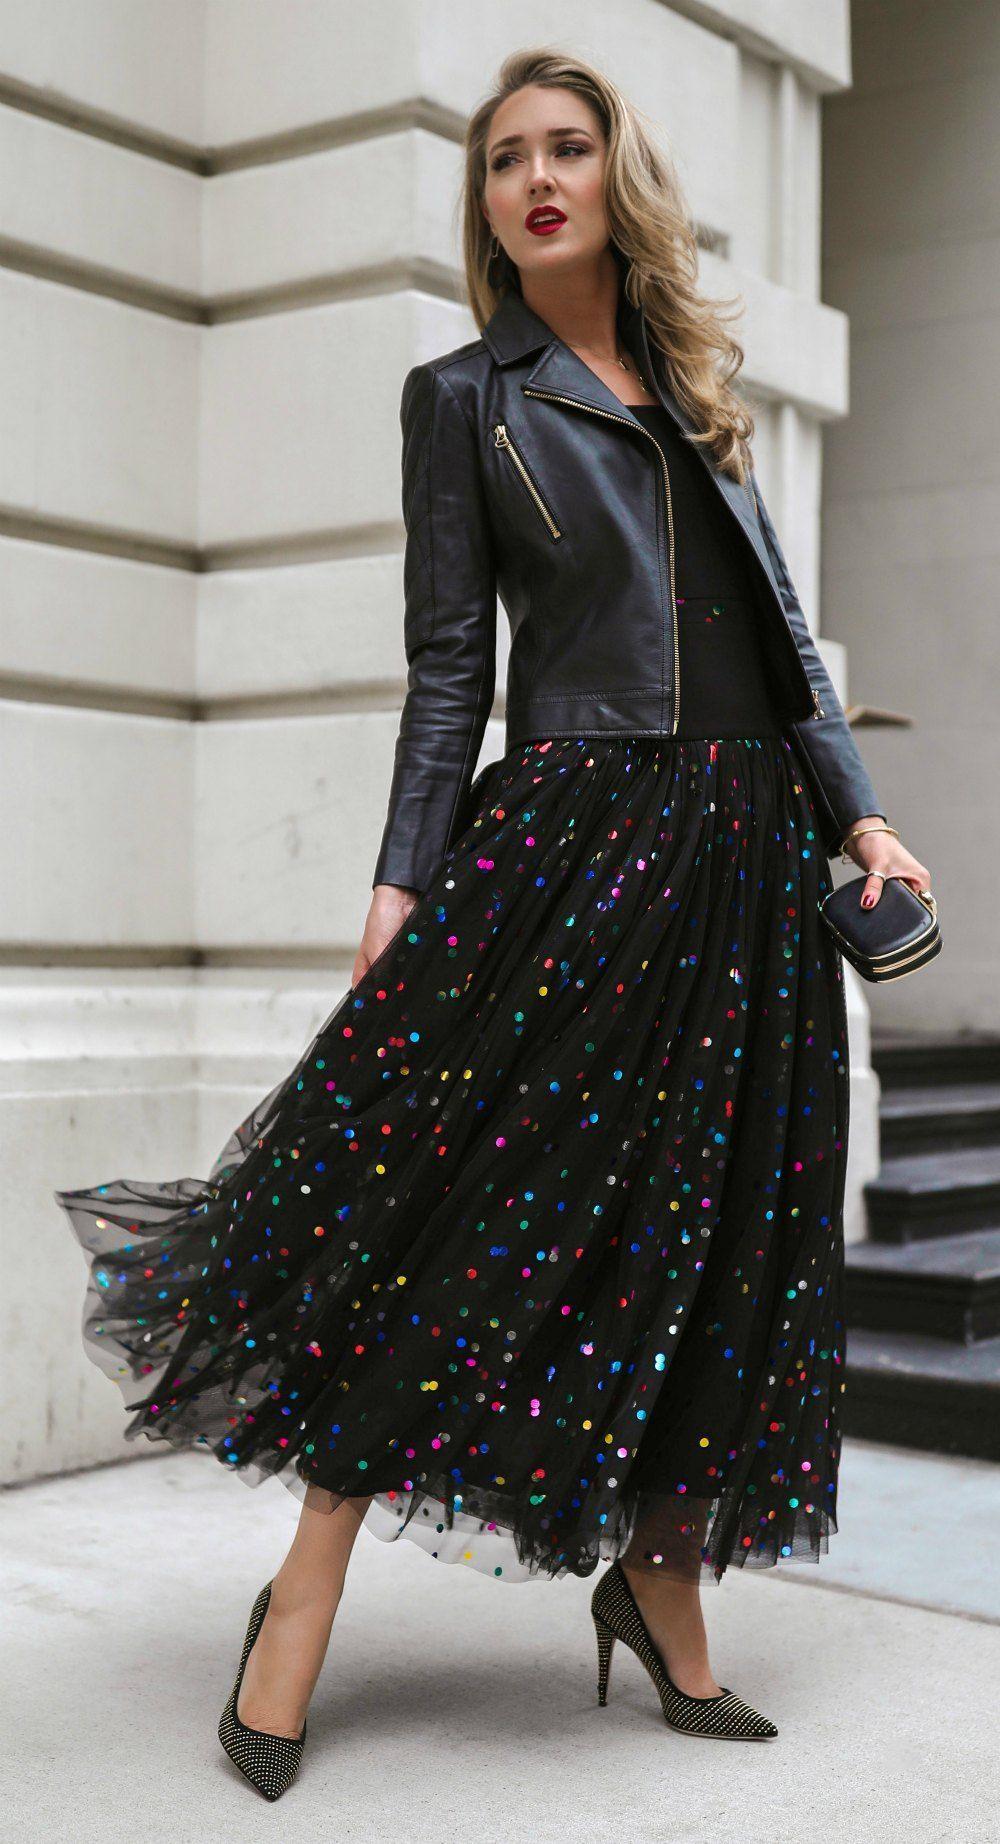 30 Dresses in 30 Days | Day 29: Birthday Party // Black metallic polka-dot tulle…